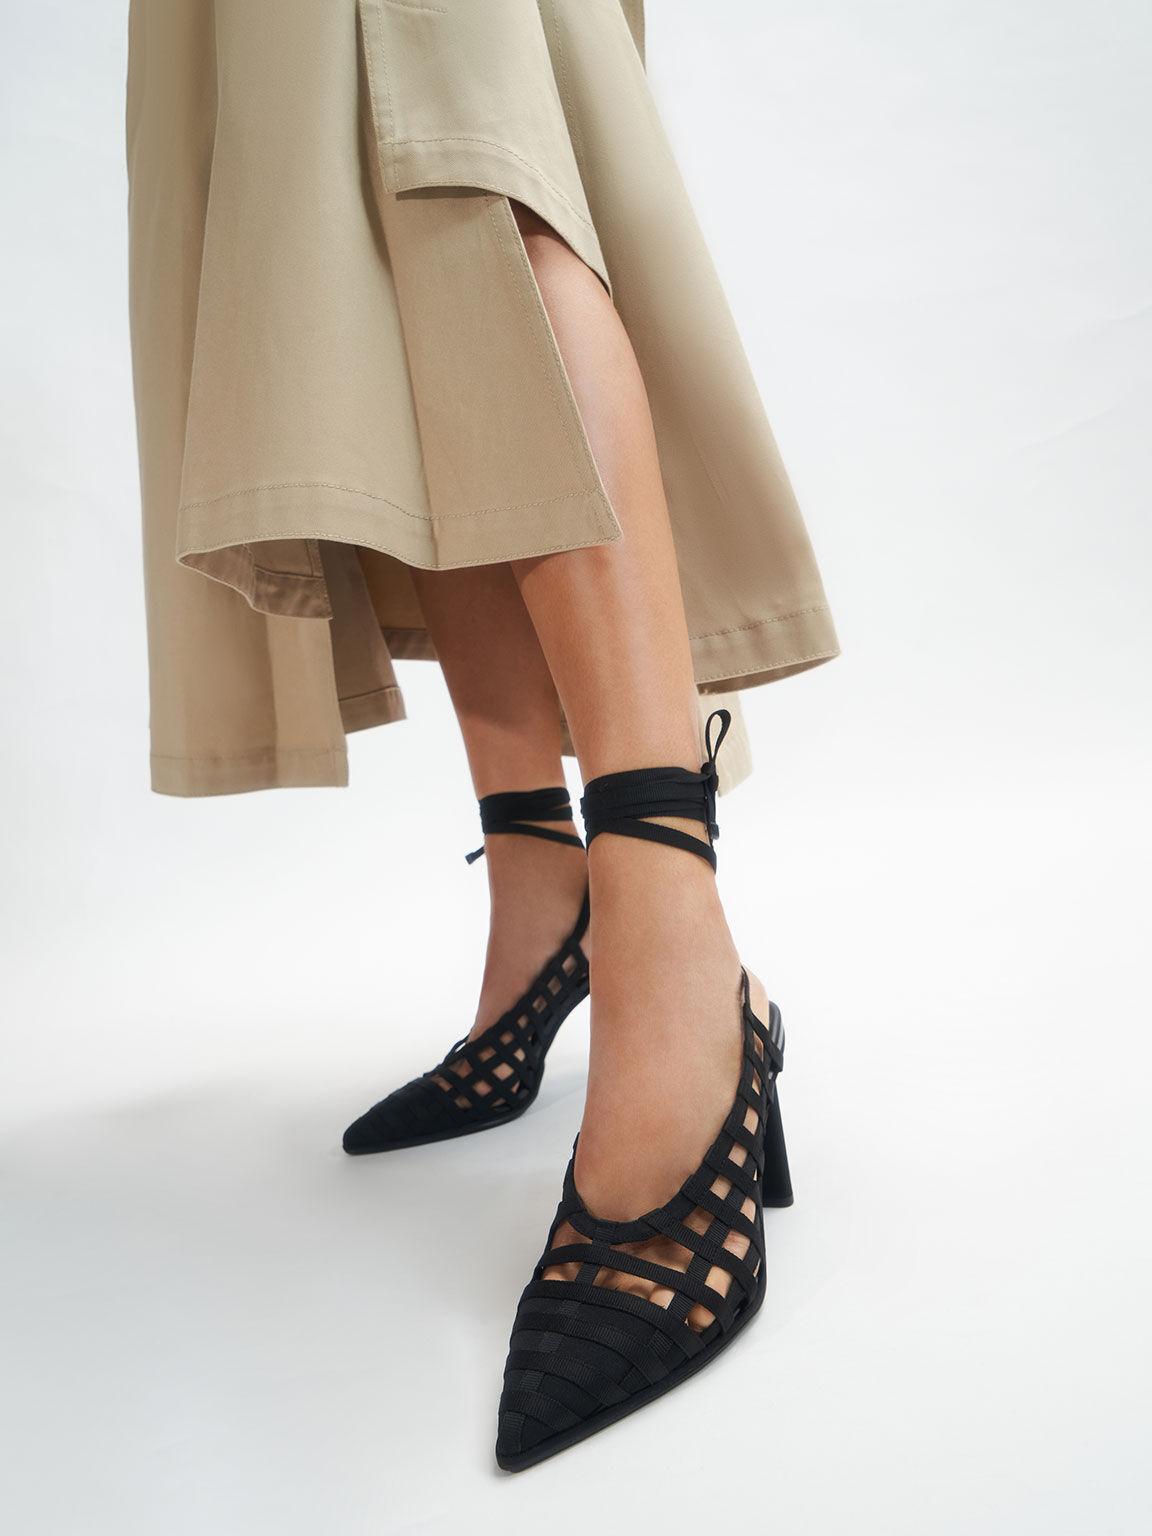 Grosgrain Tie-Around Caged Court Shoes, Black, hi-res